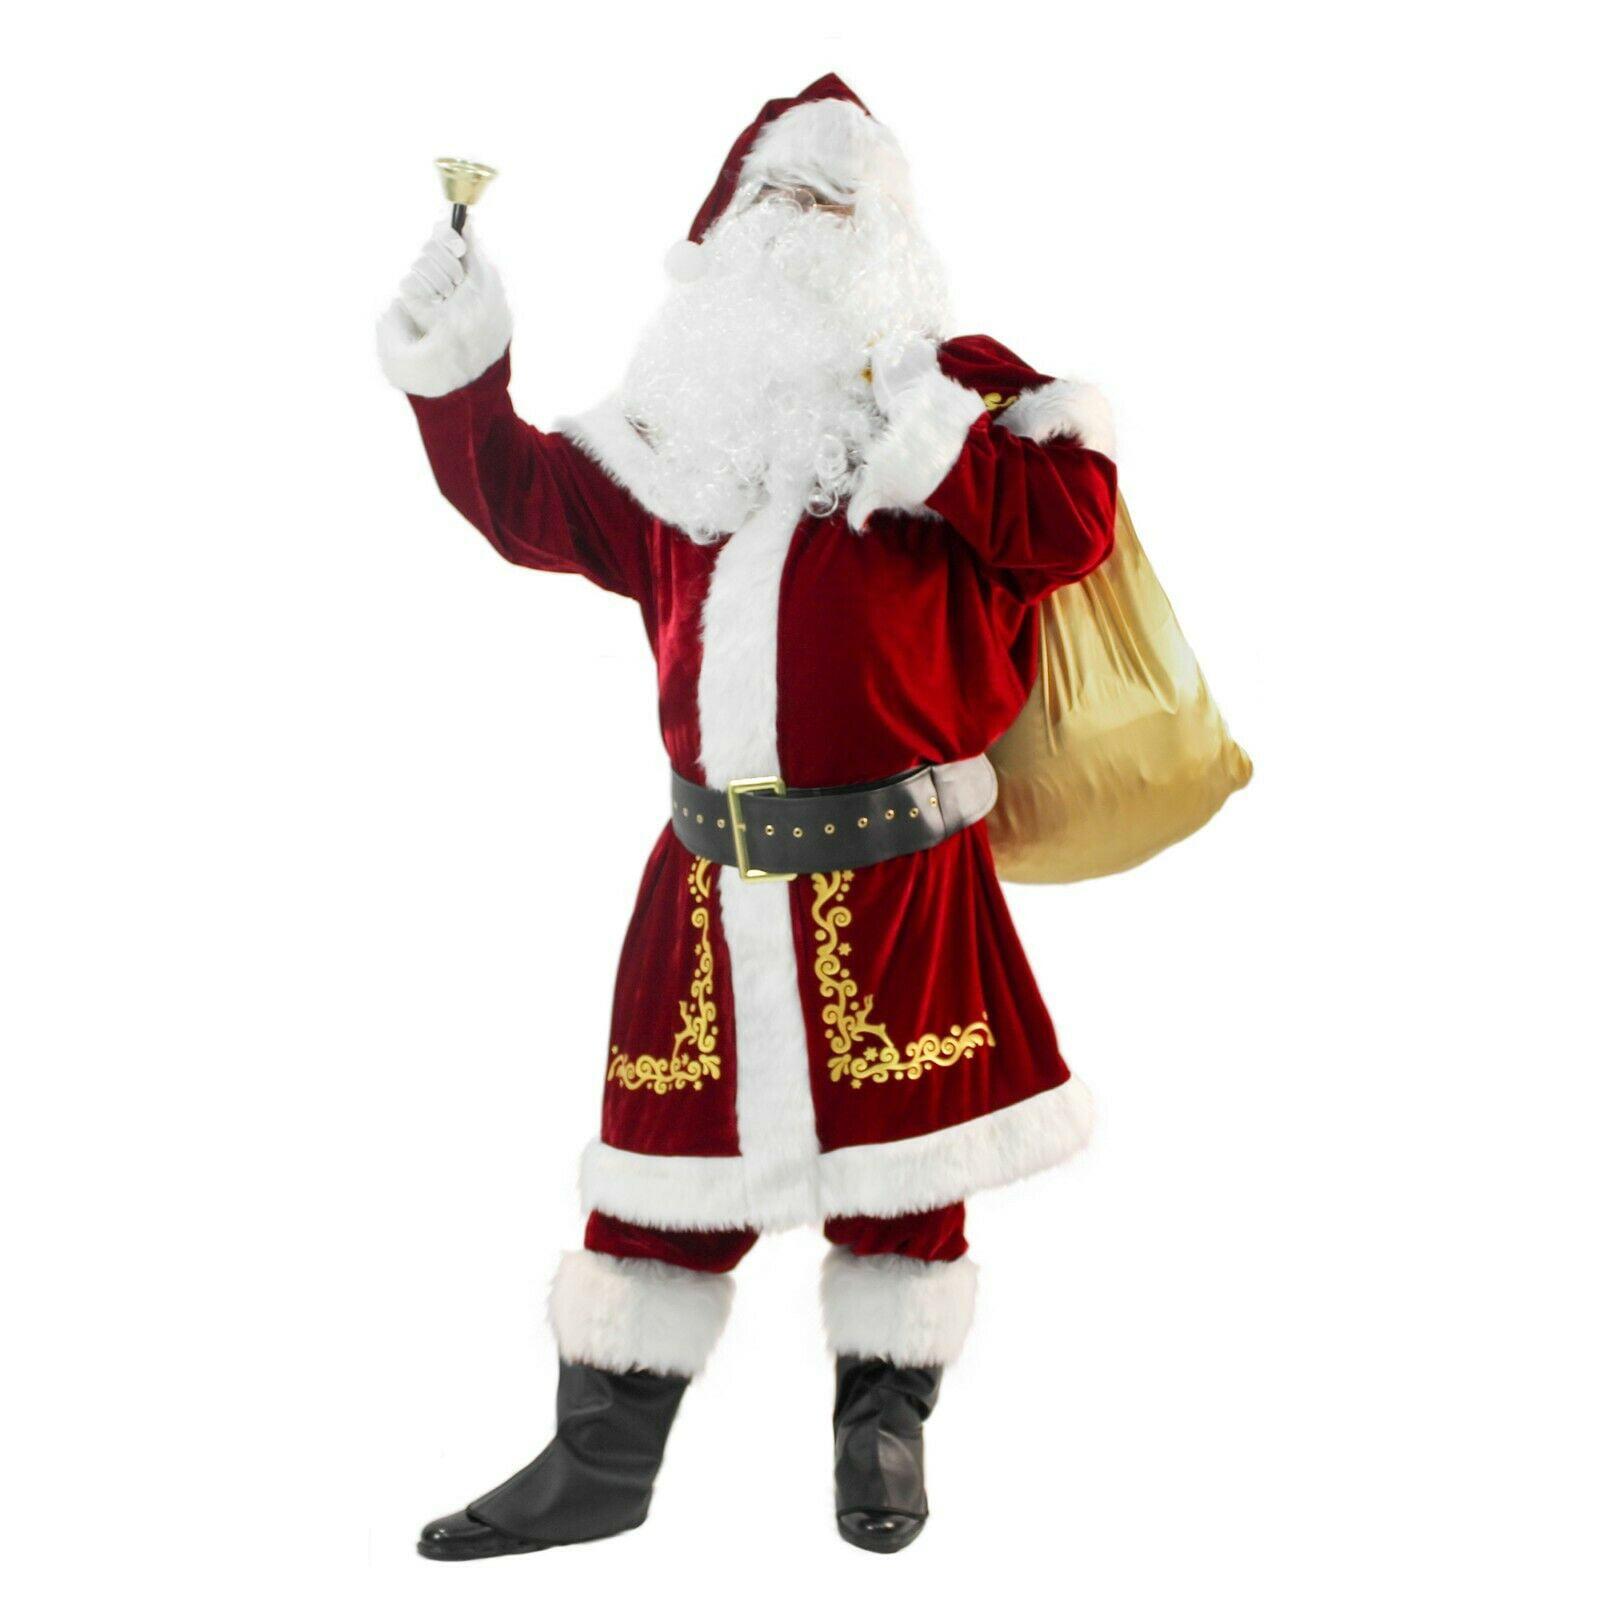 Christmas Santa Claus Costume with Beards Santa Suit Adult Men Deluxe 19 Pcs